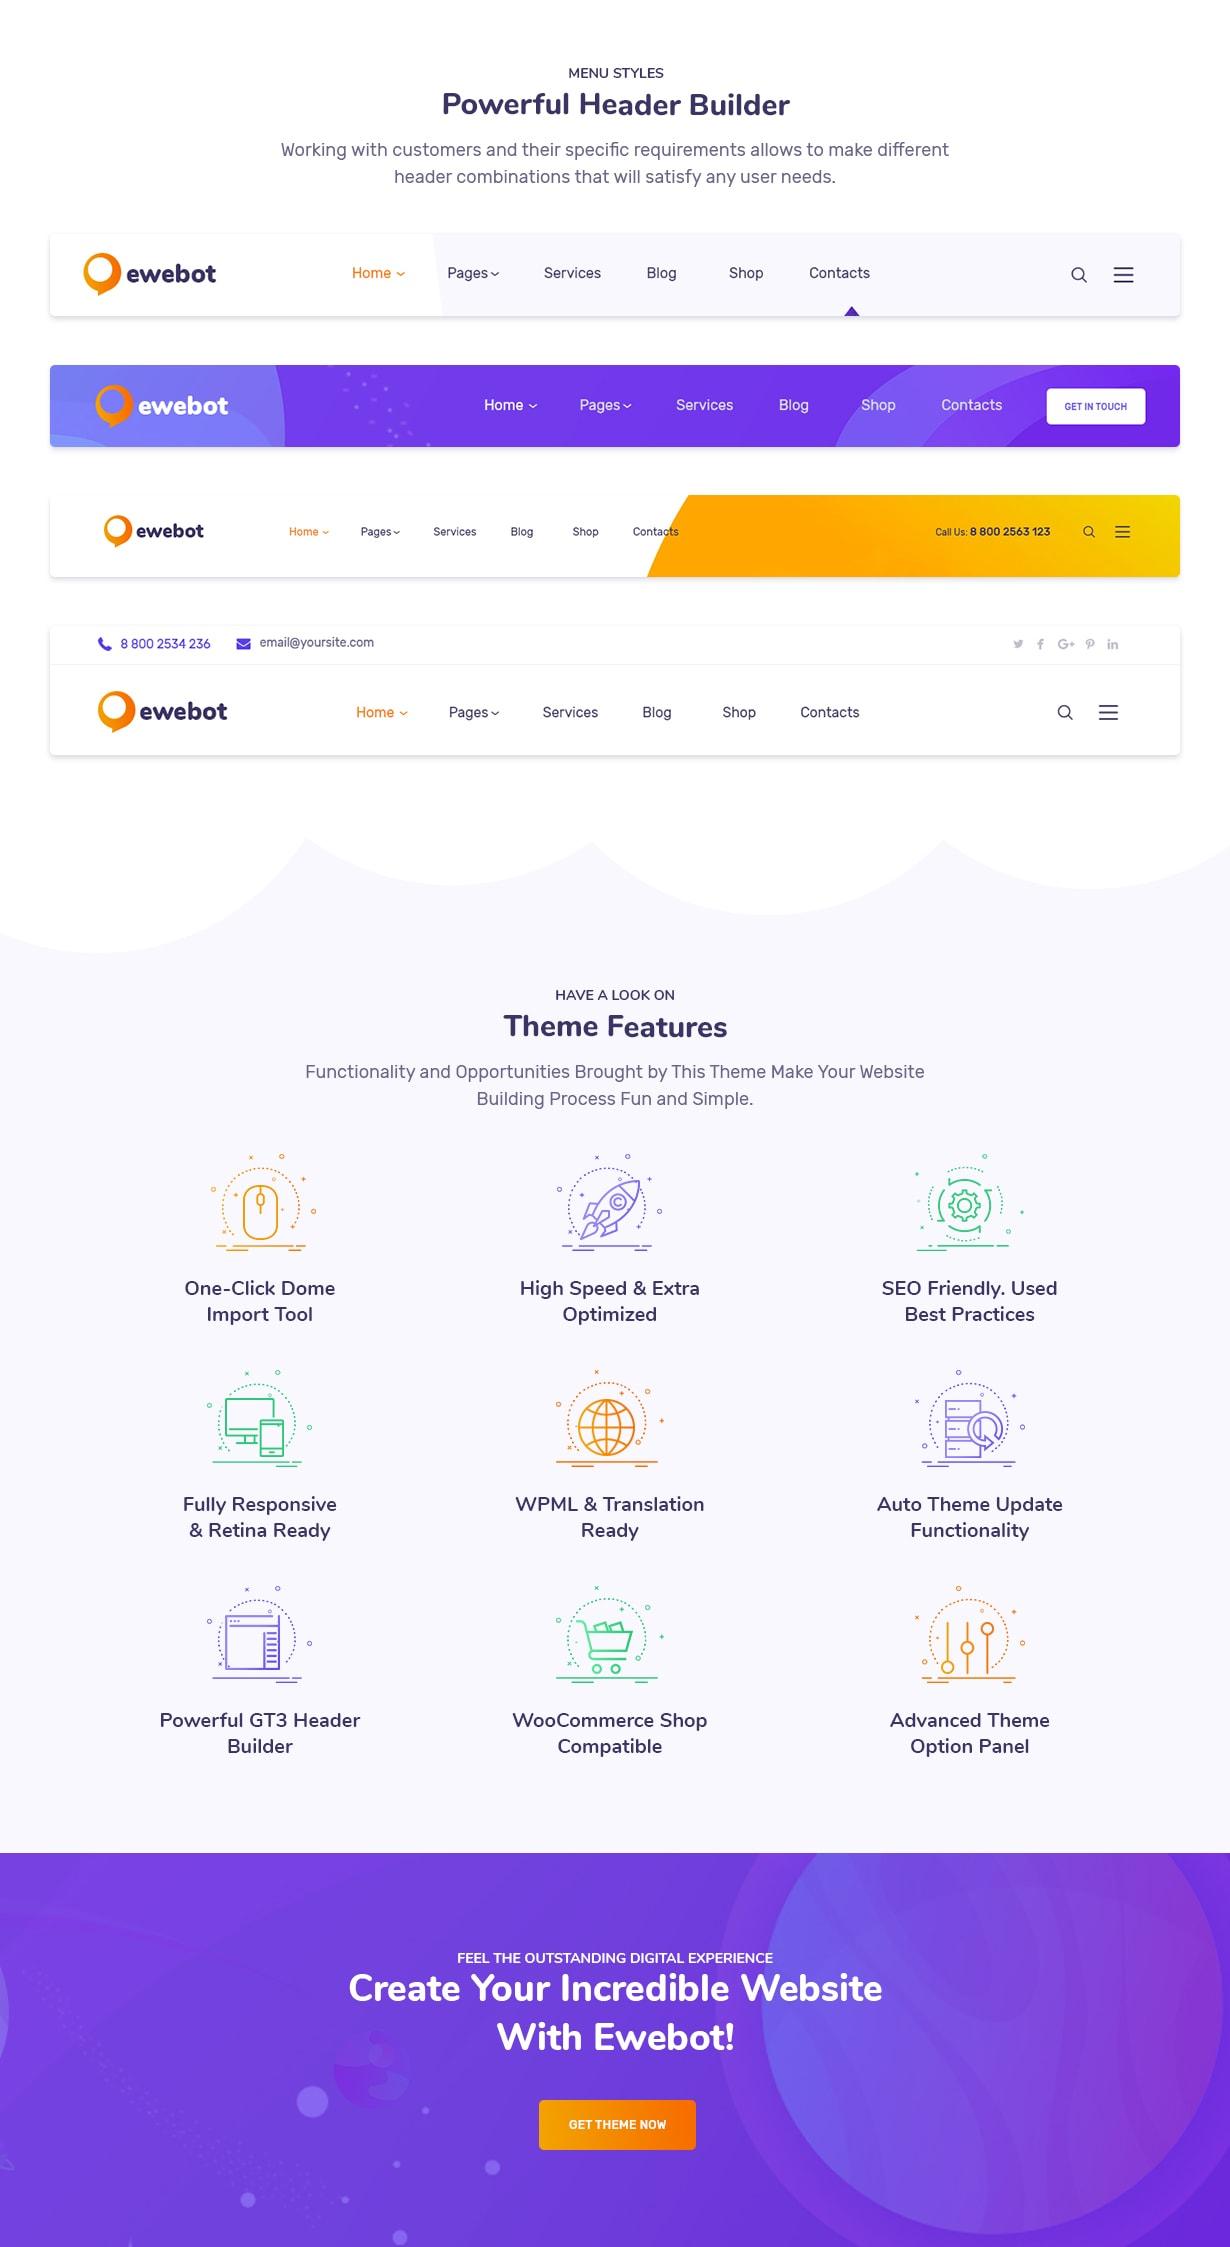 ewebot wp5 - Ewebot - SEO Marketing & Digital Agency